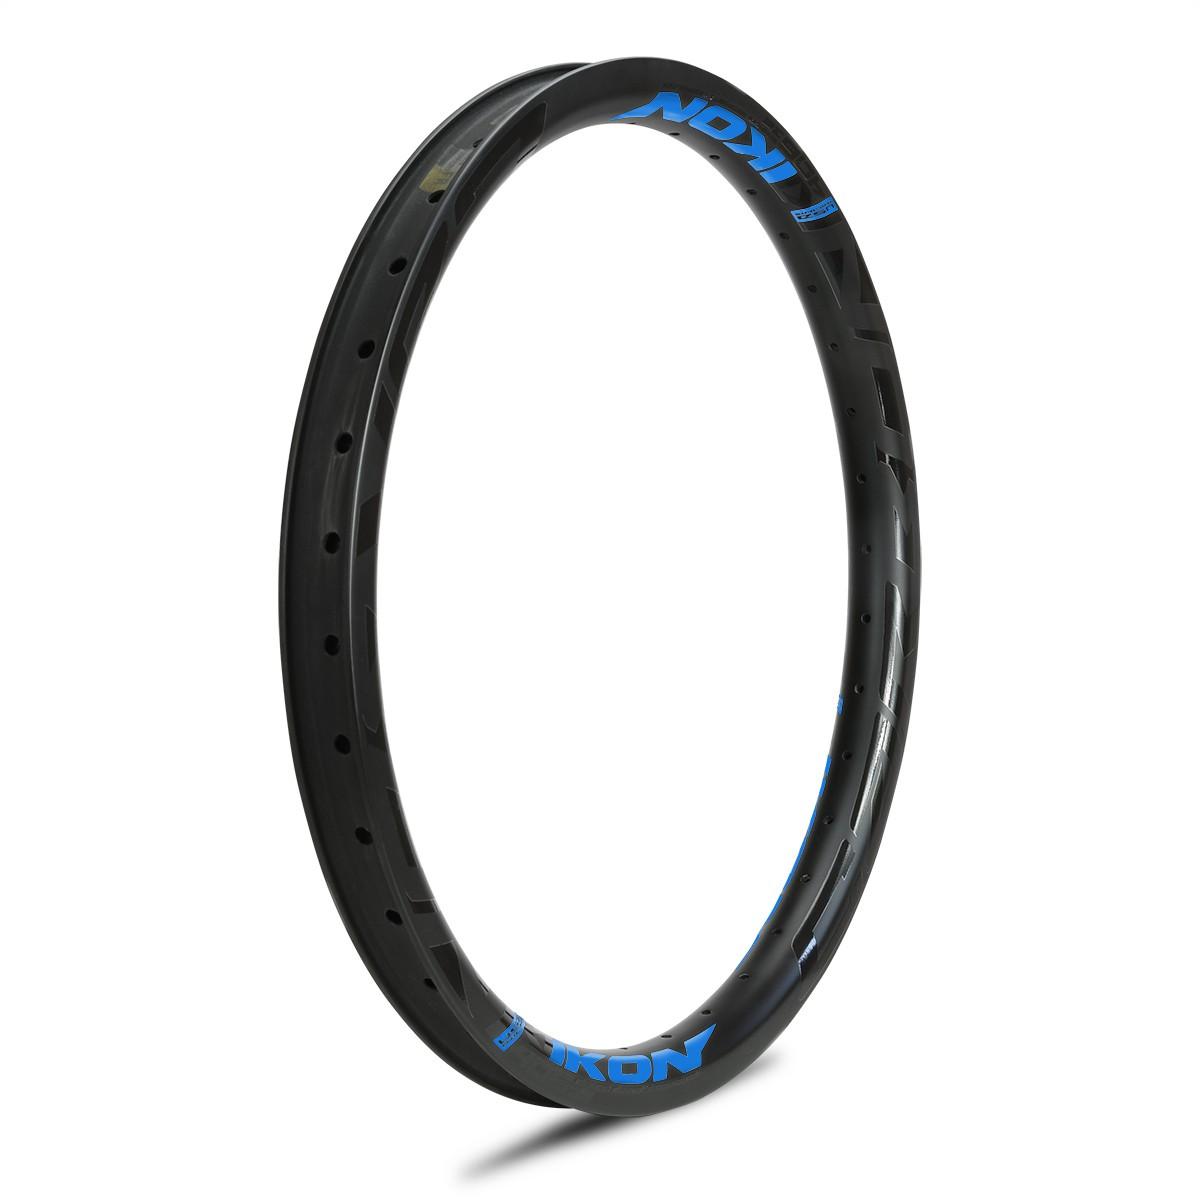 ikon-carbon-rim-406x32mm-36h-no-brake-surface (1)